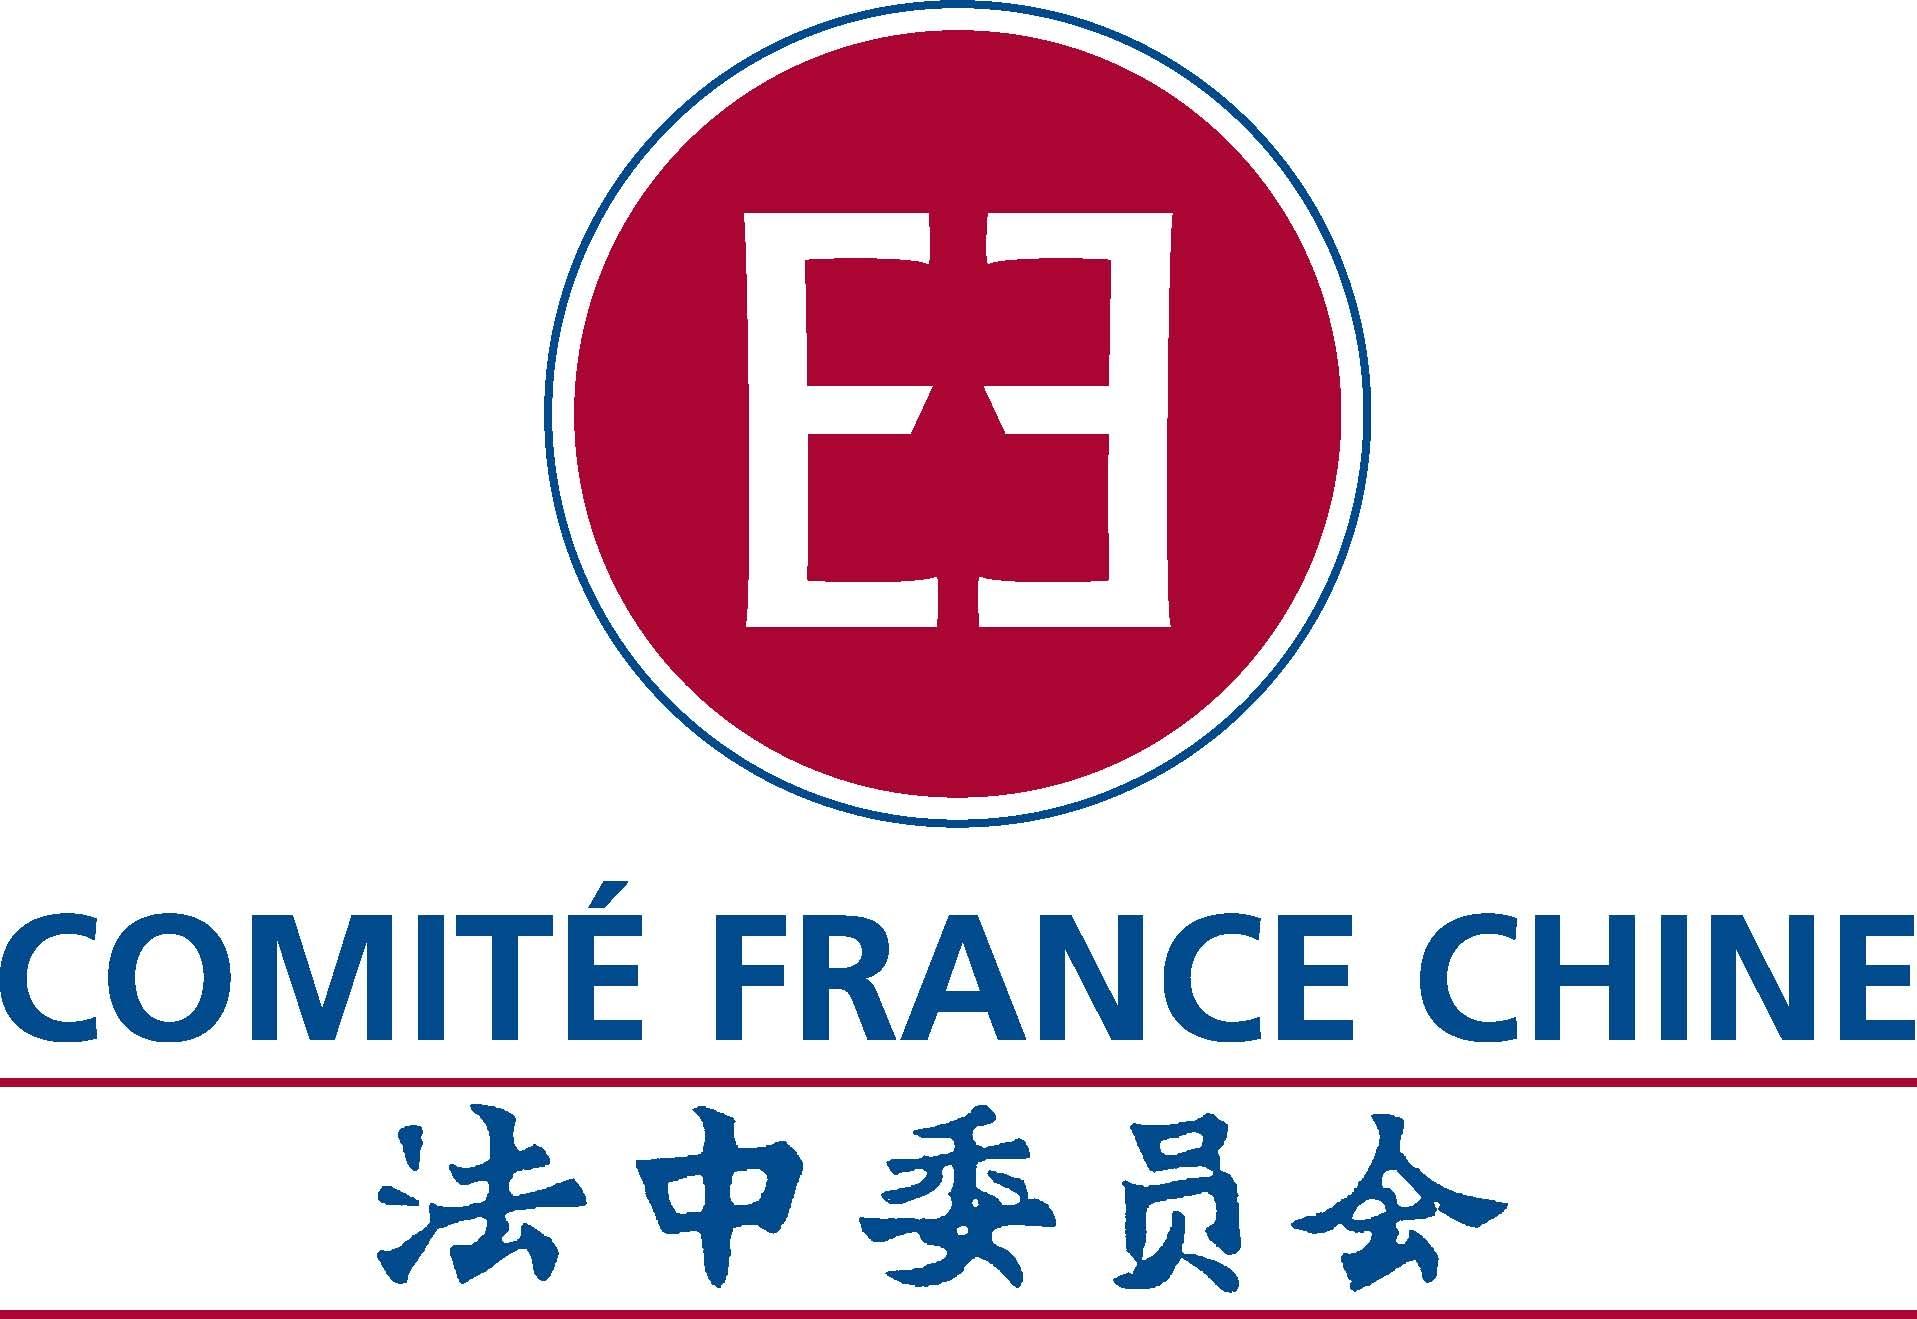 FRANCE CHINE LOGO 2010 08 25